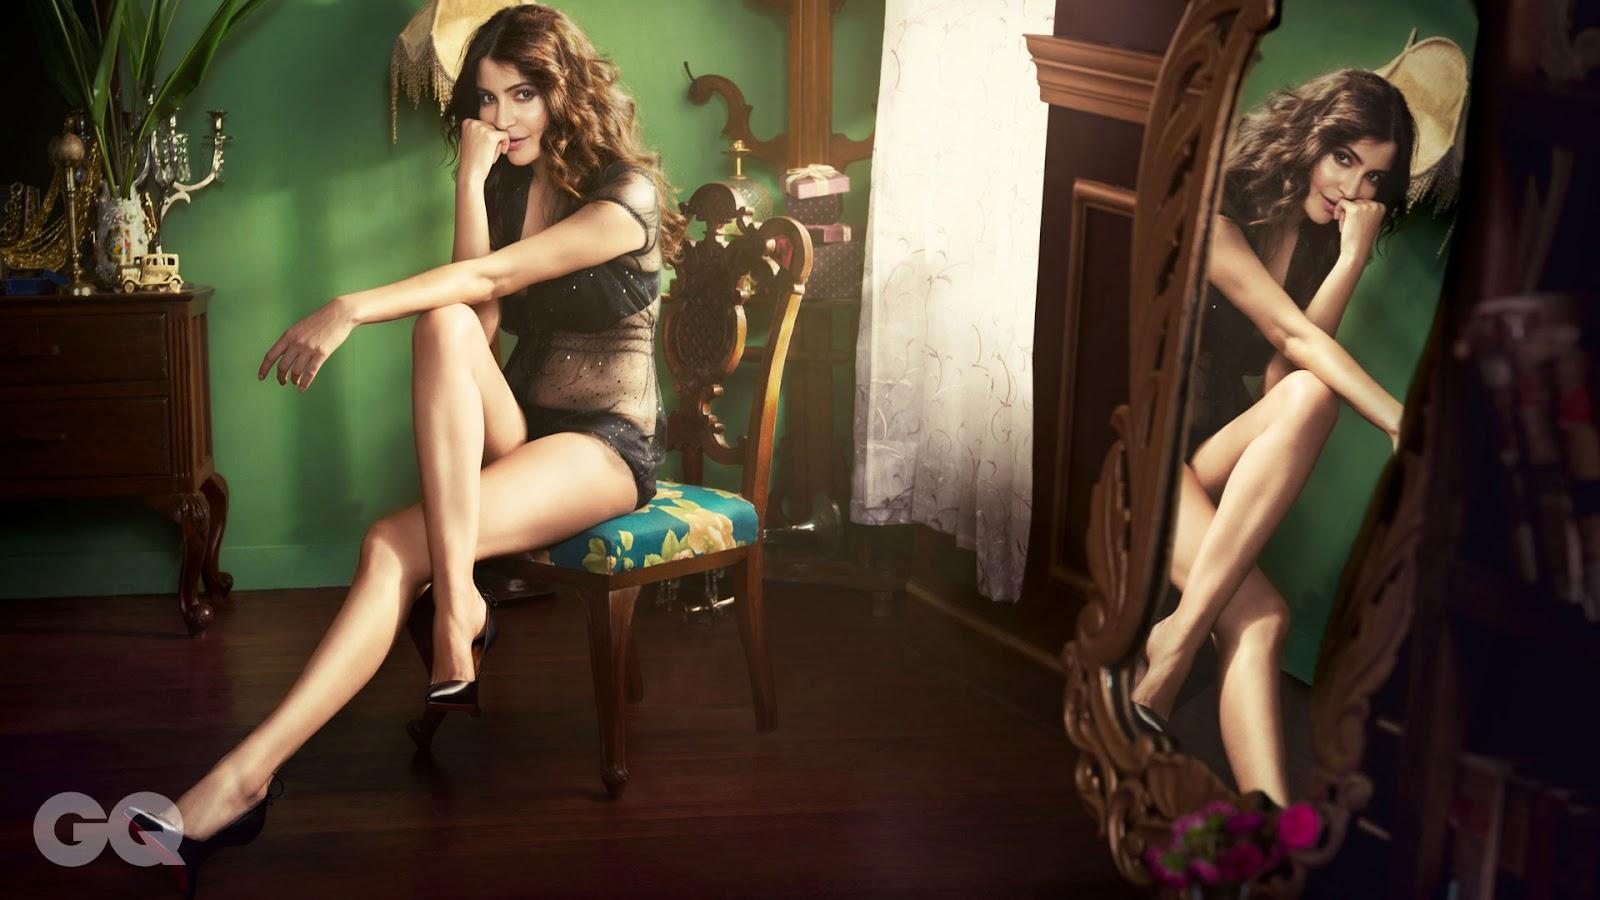 Anushka Sharma Bikini Wallpaper in GQ magazine